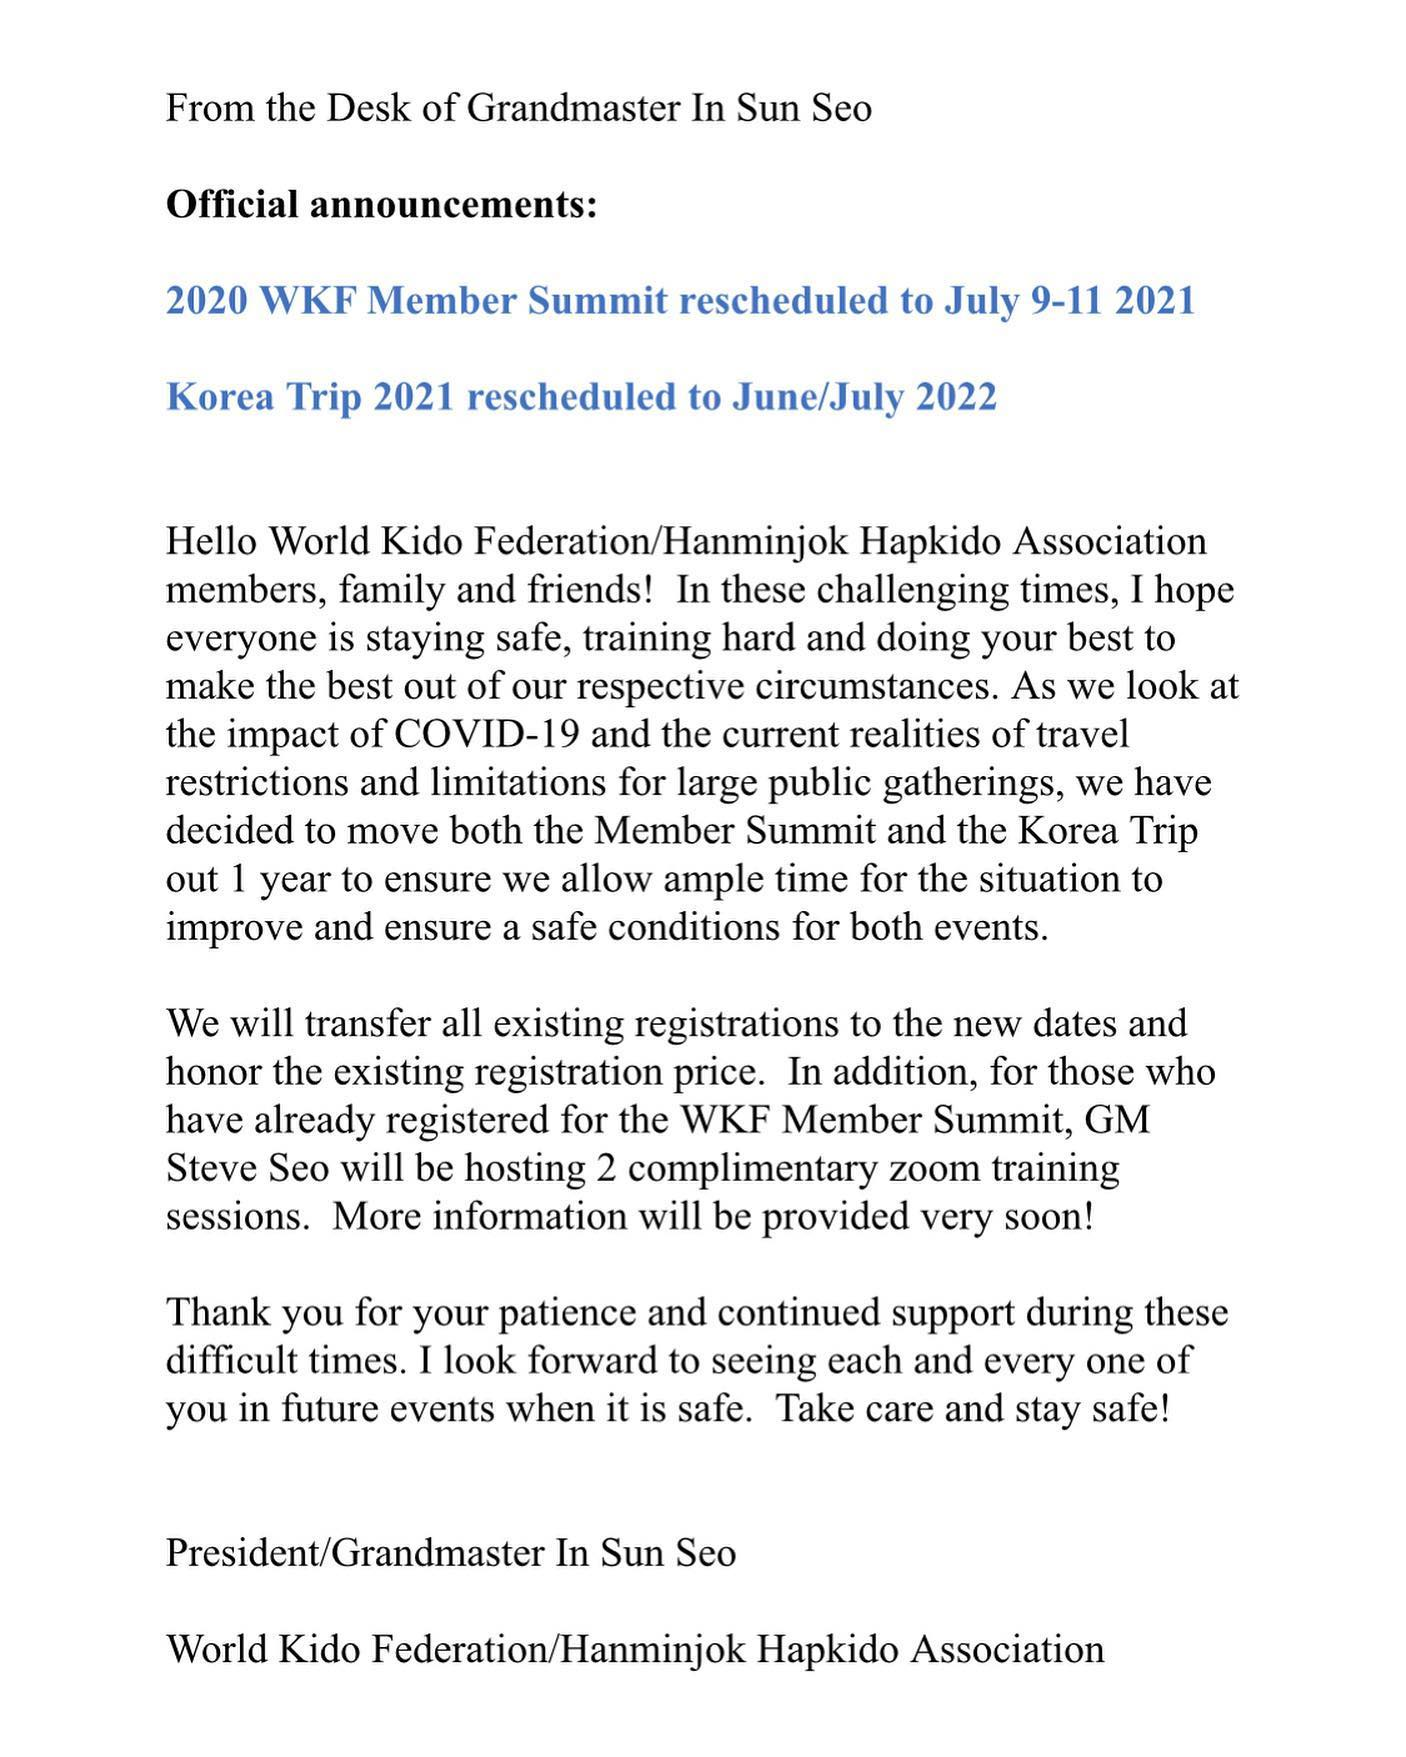 2020 WKF Summit